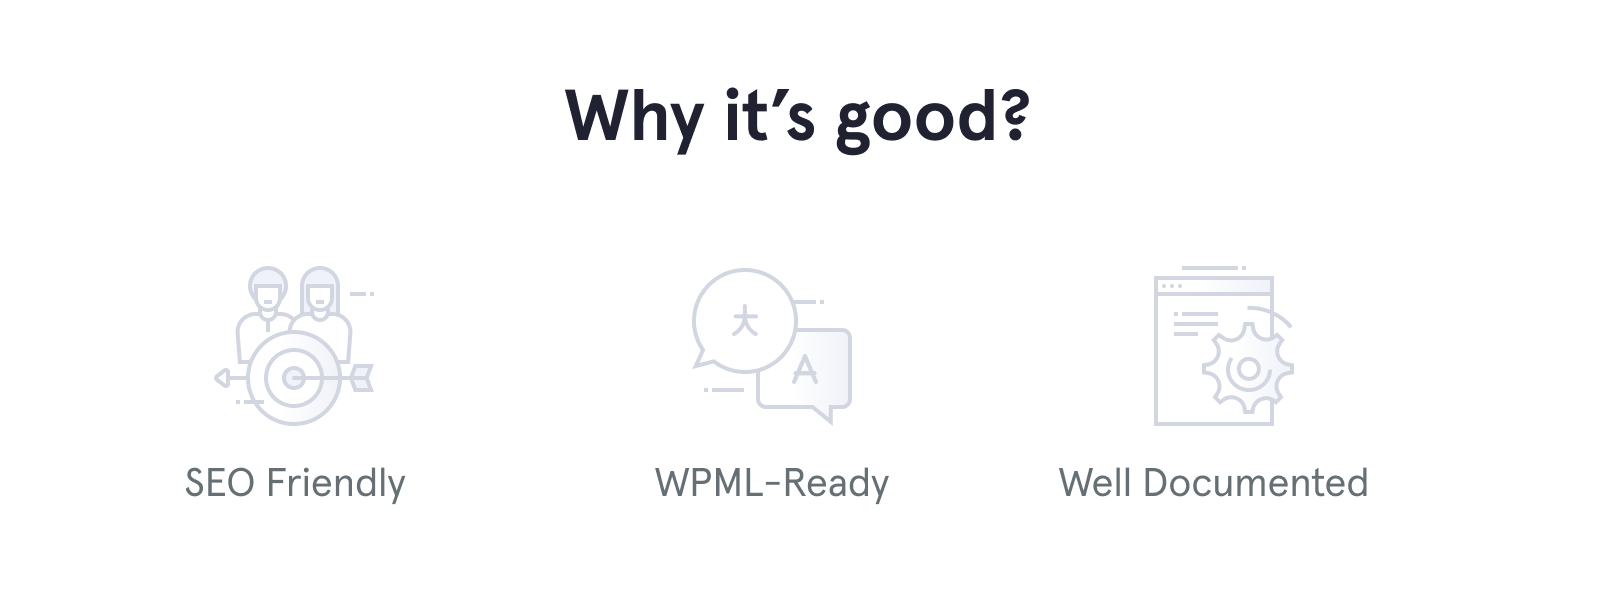 Agenda - Consulting Agency WordPress Theme